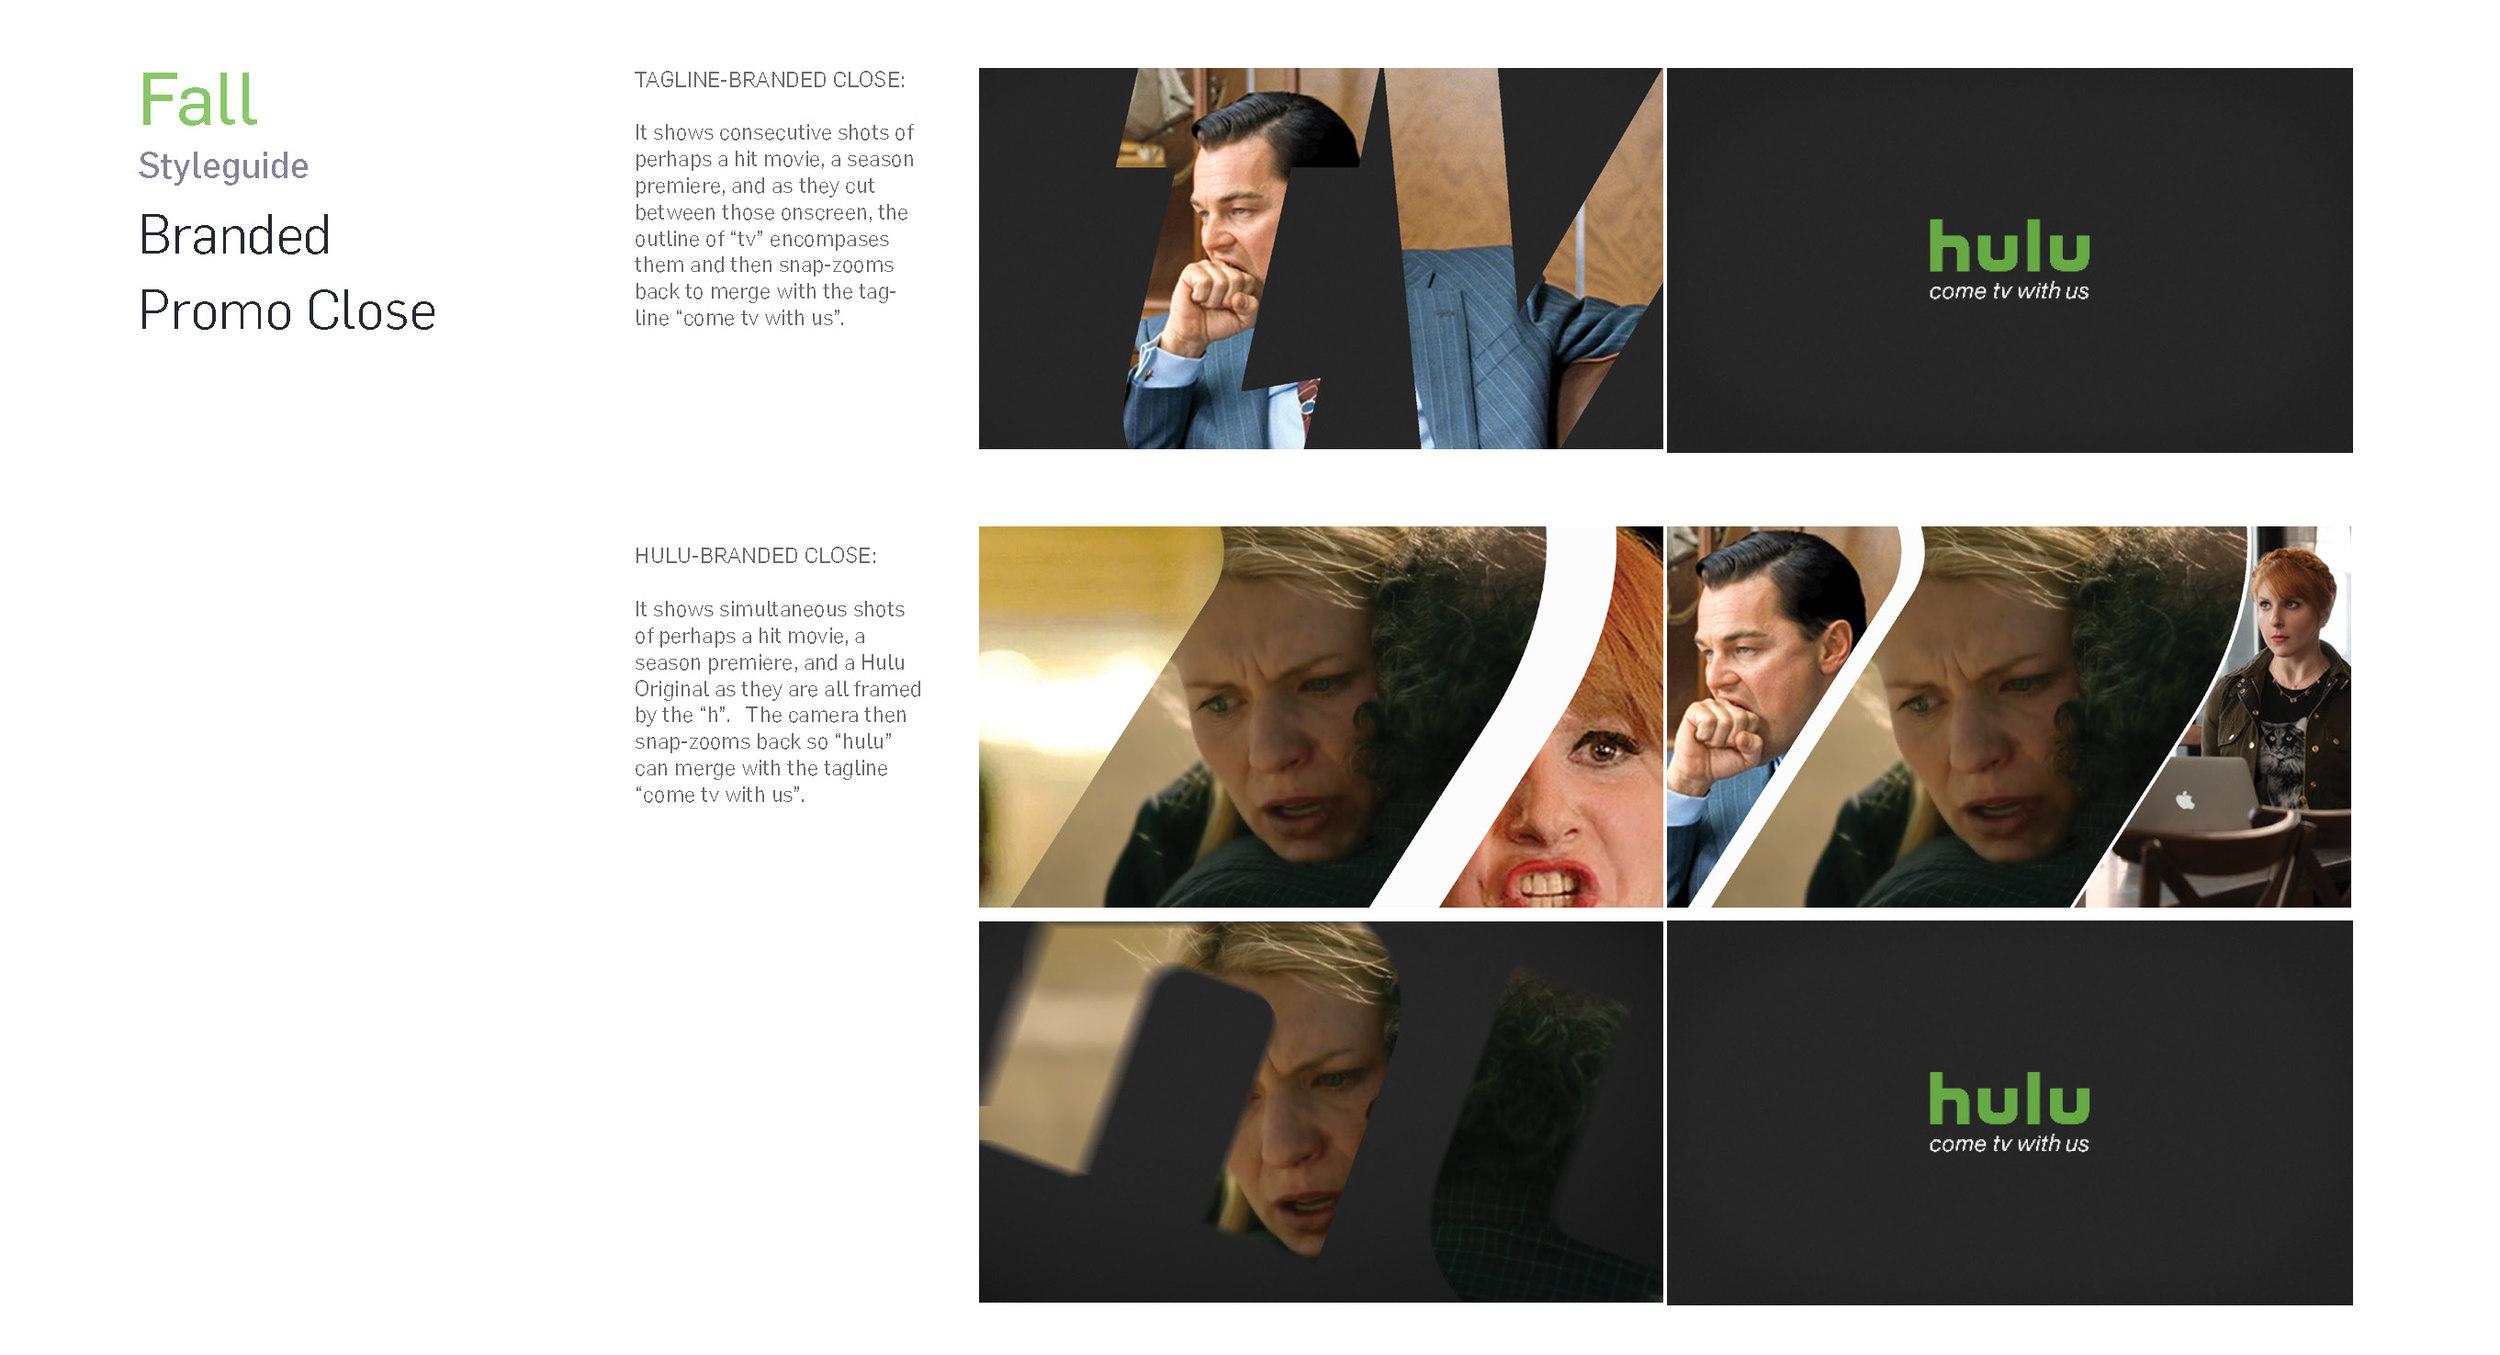 fall-styleguide-v2_Page_12.jpg